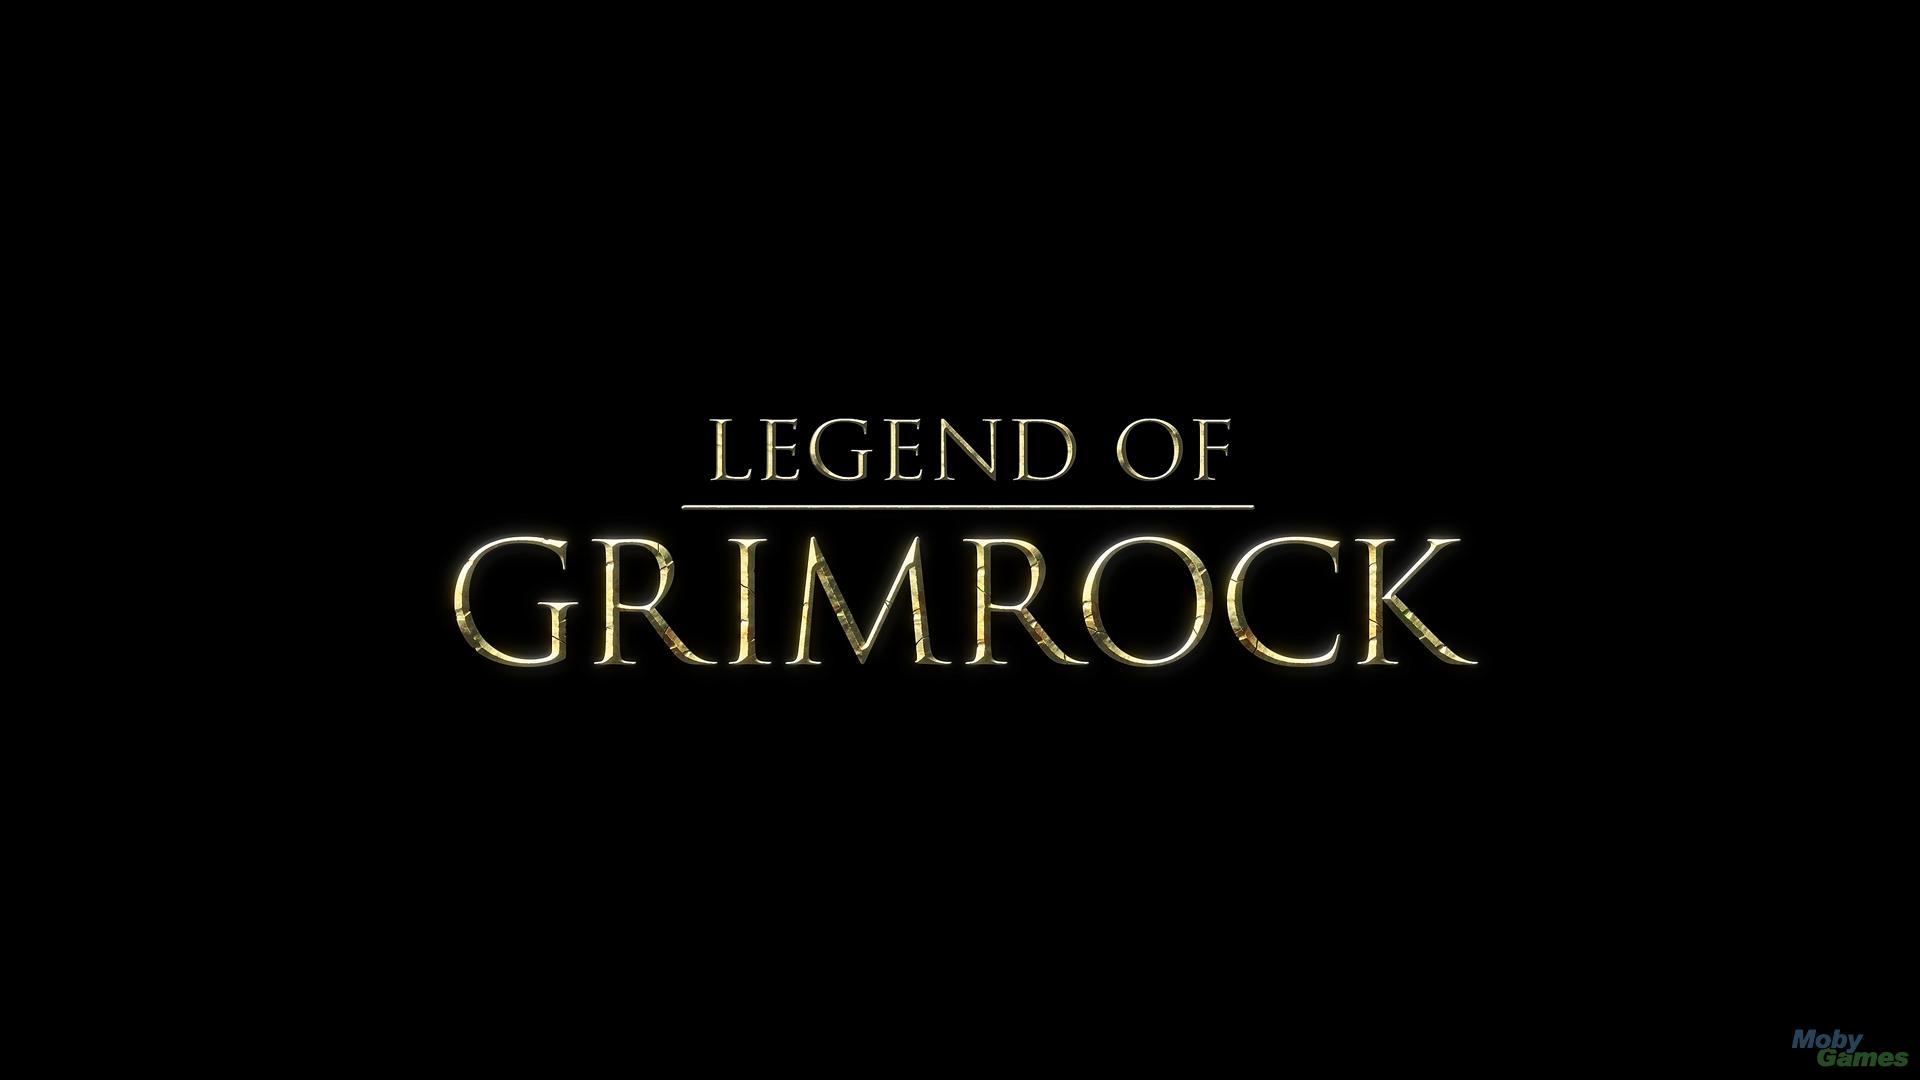 Legend of Grimrock Port Coming to iOS